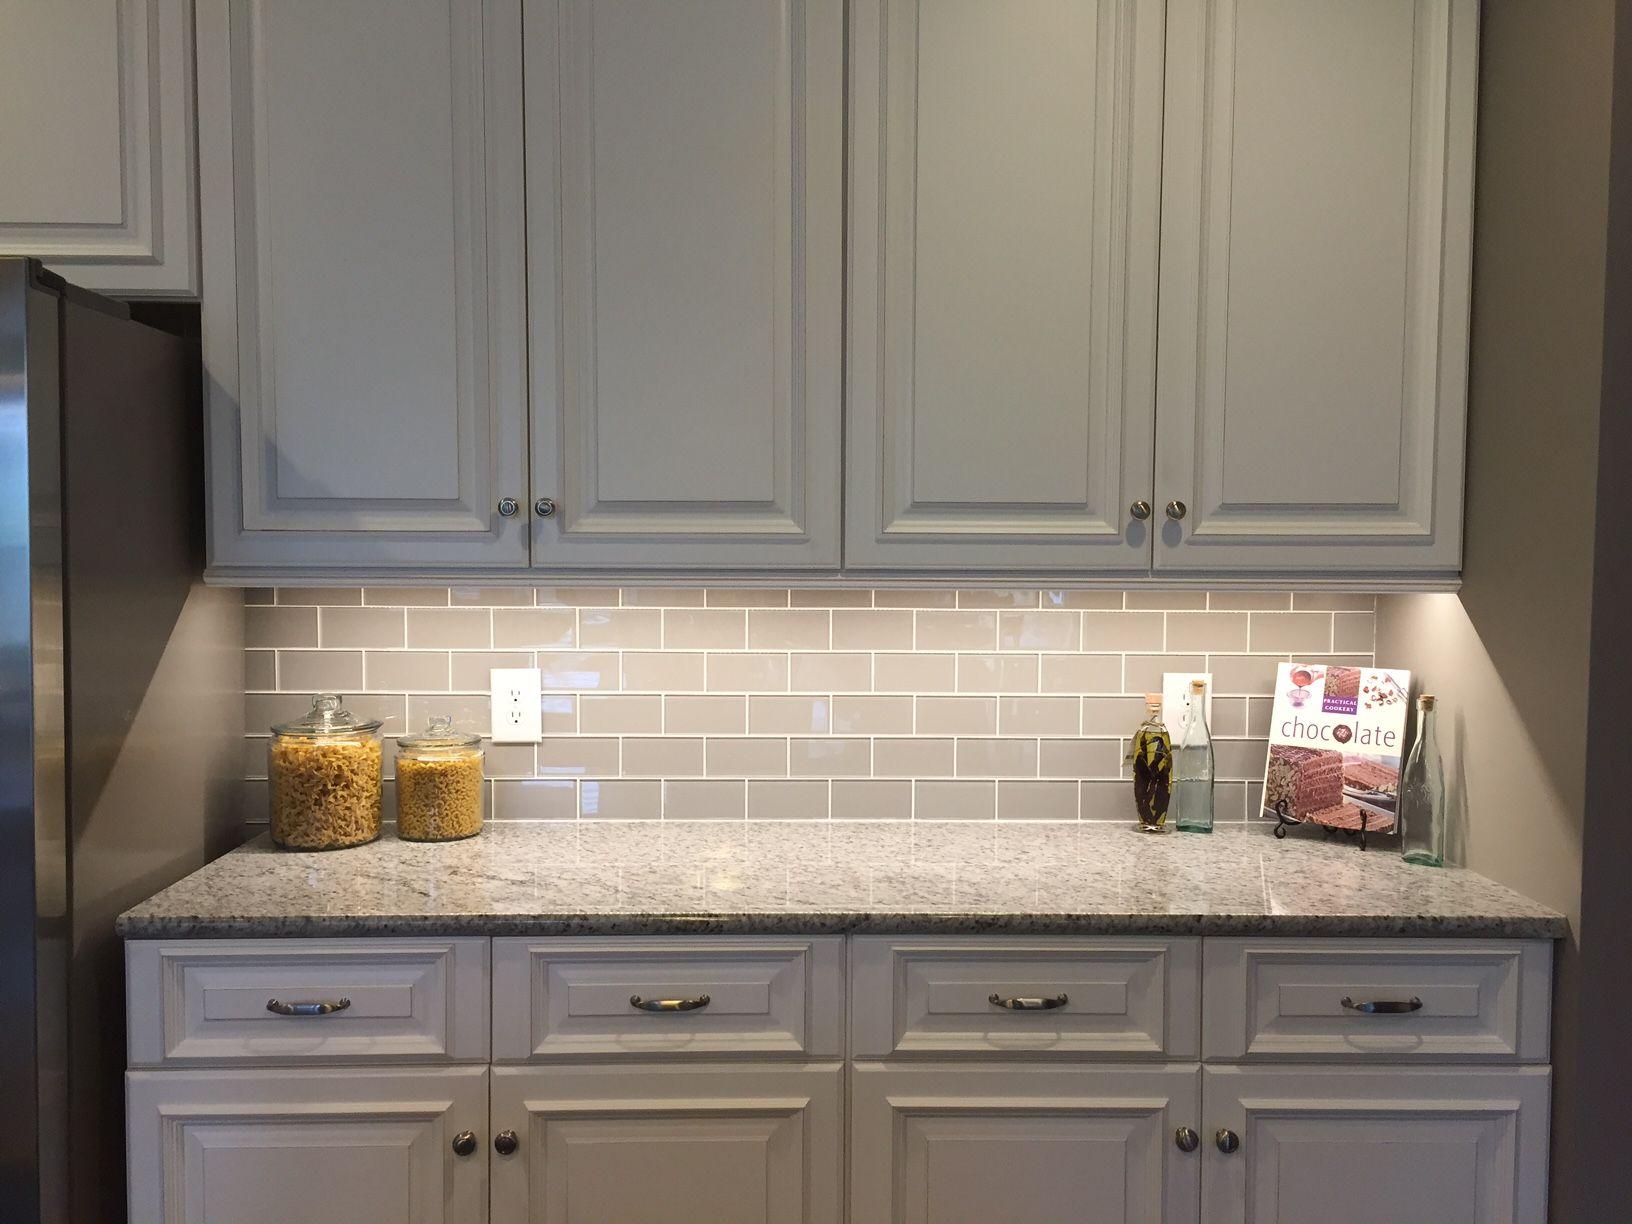 glass subway tile kitchen backsplash sink with side drain board smoke